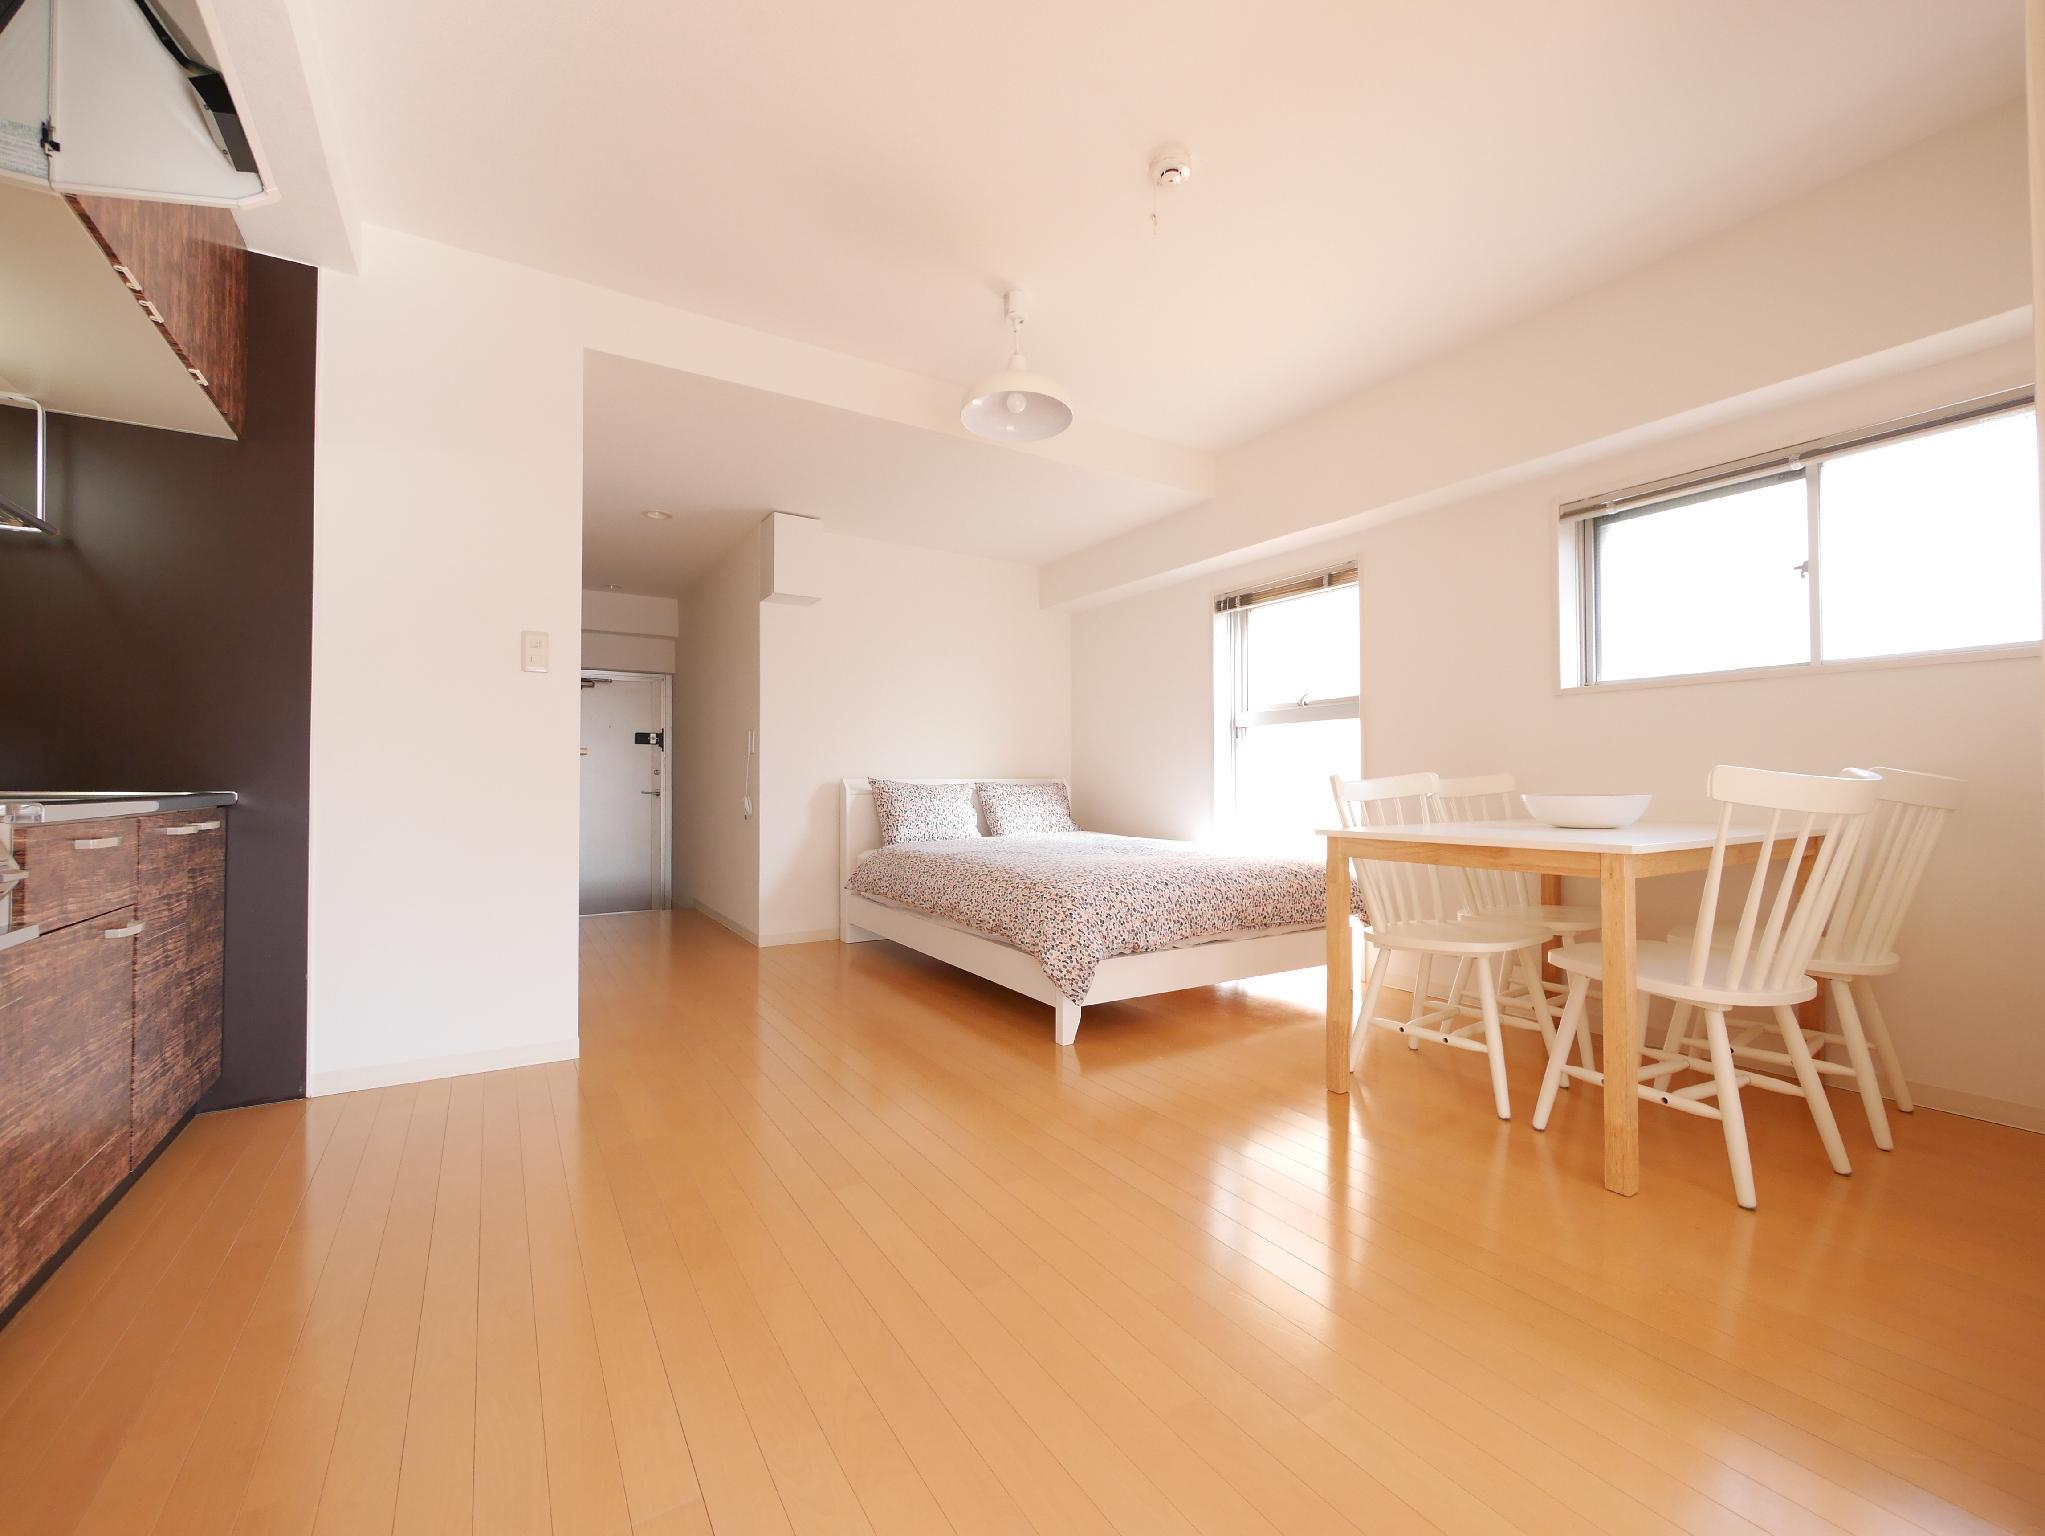 31 Sunny And Spacious Room Yoyogi Shibuya